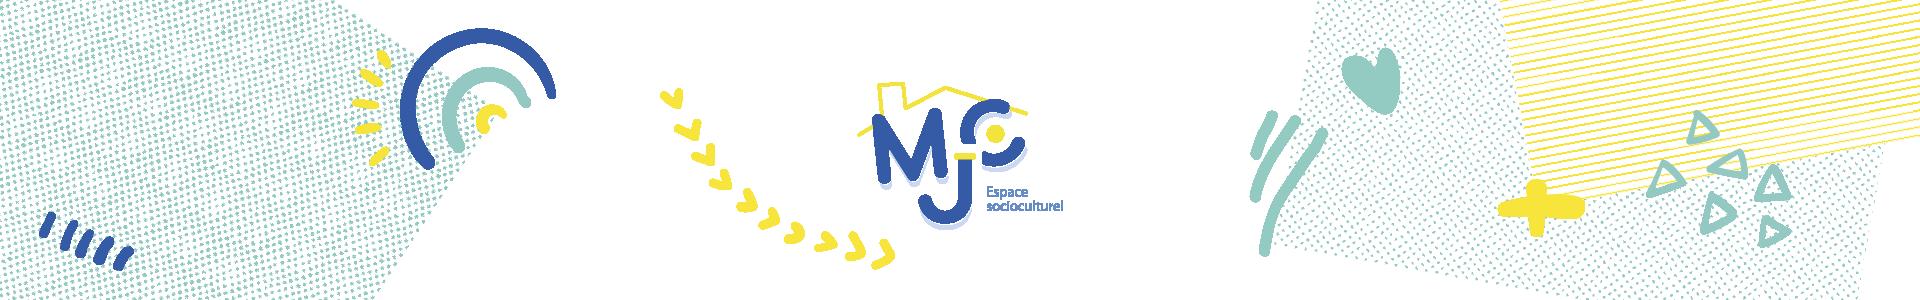 mjc-guipry-messac-bandeau